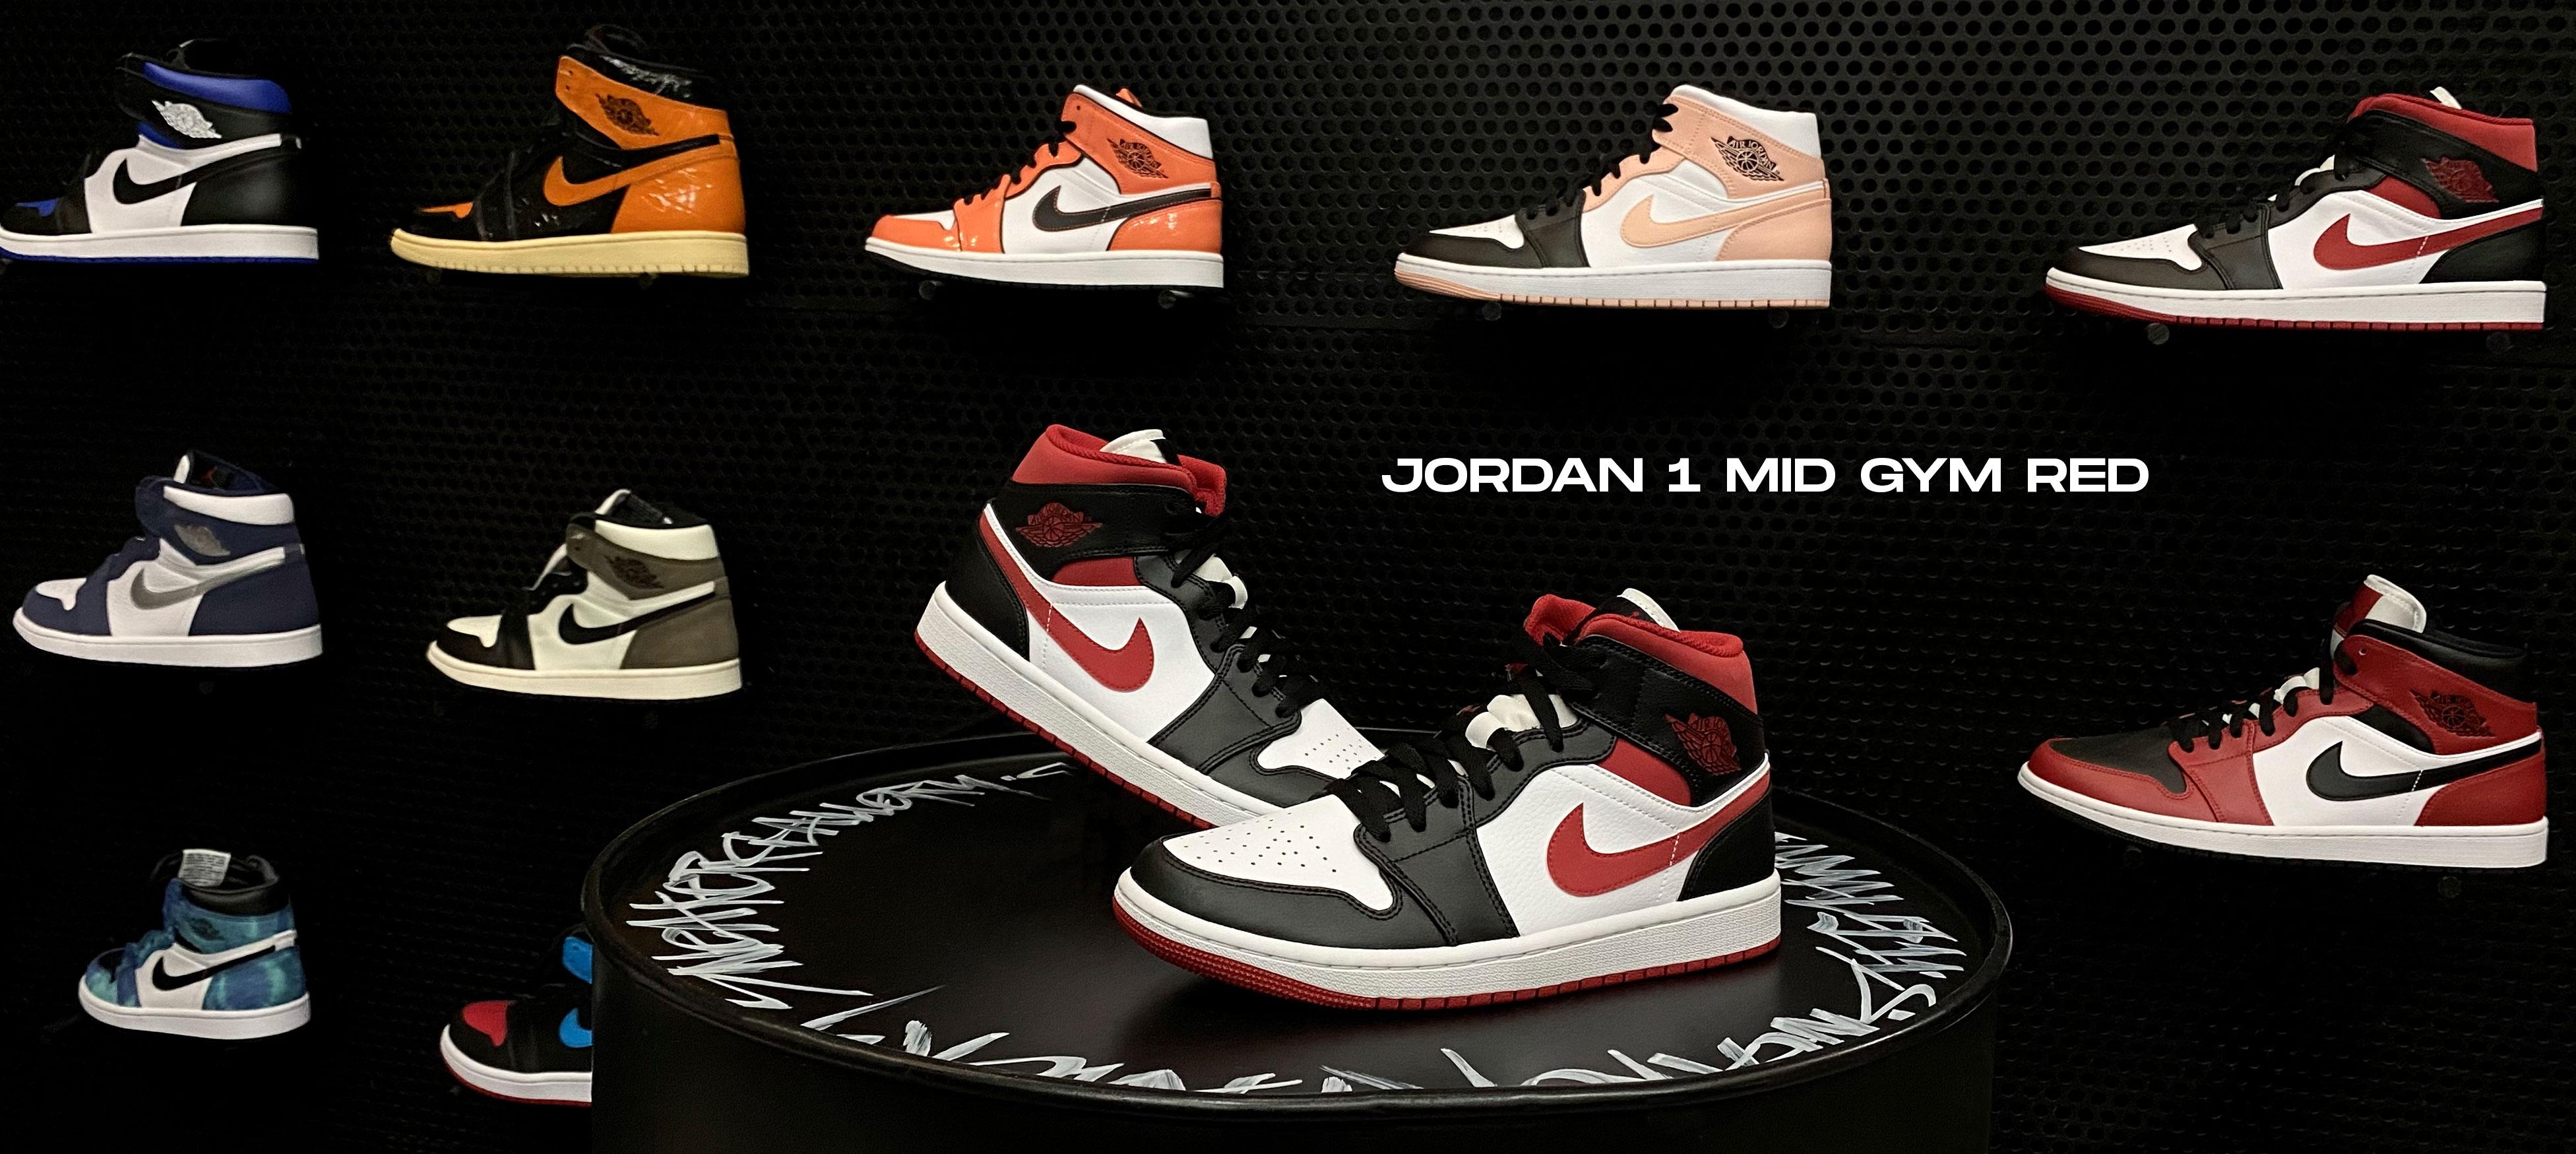 Jordan 1 Mid Gym Red